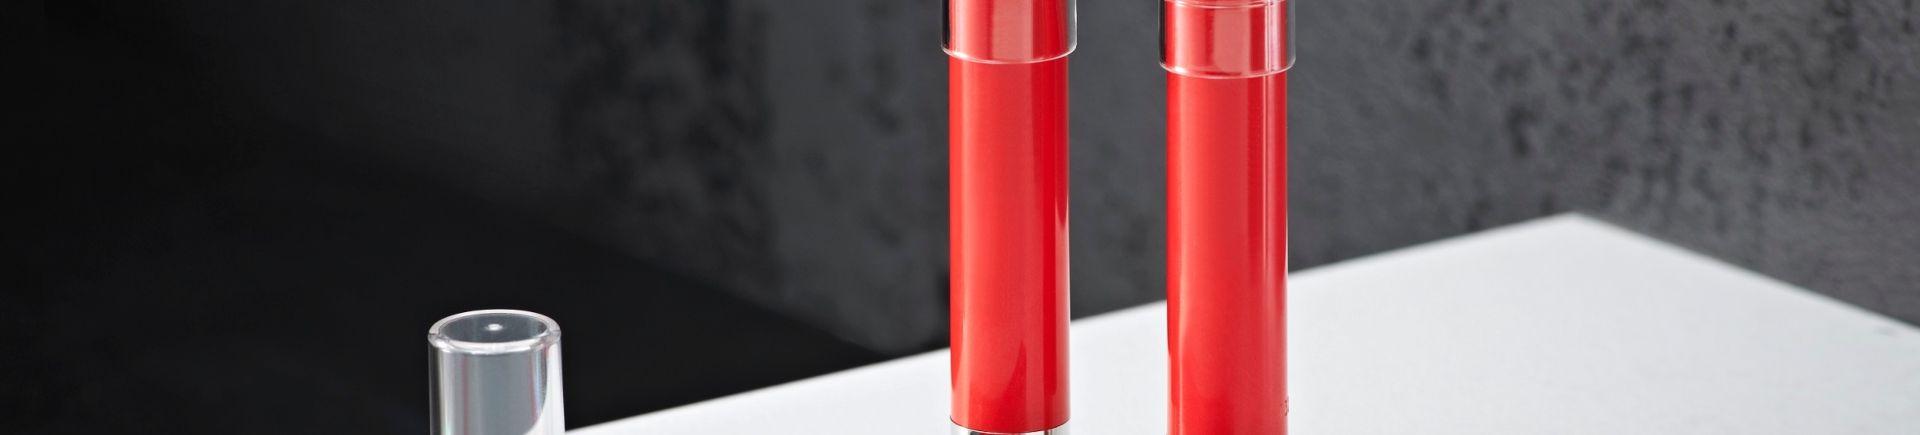 make-up stick